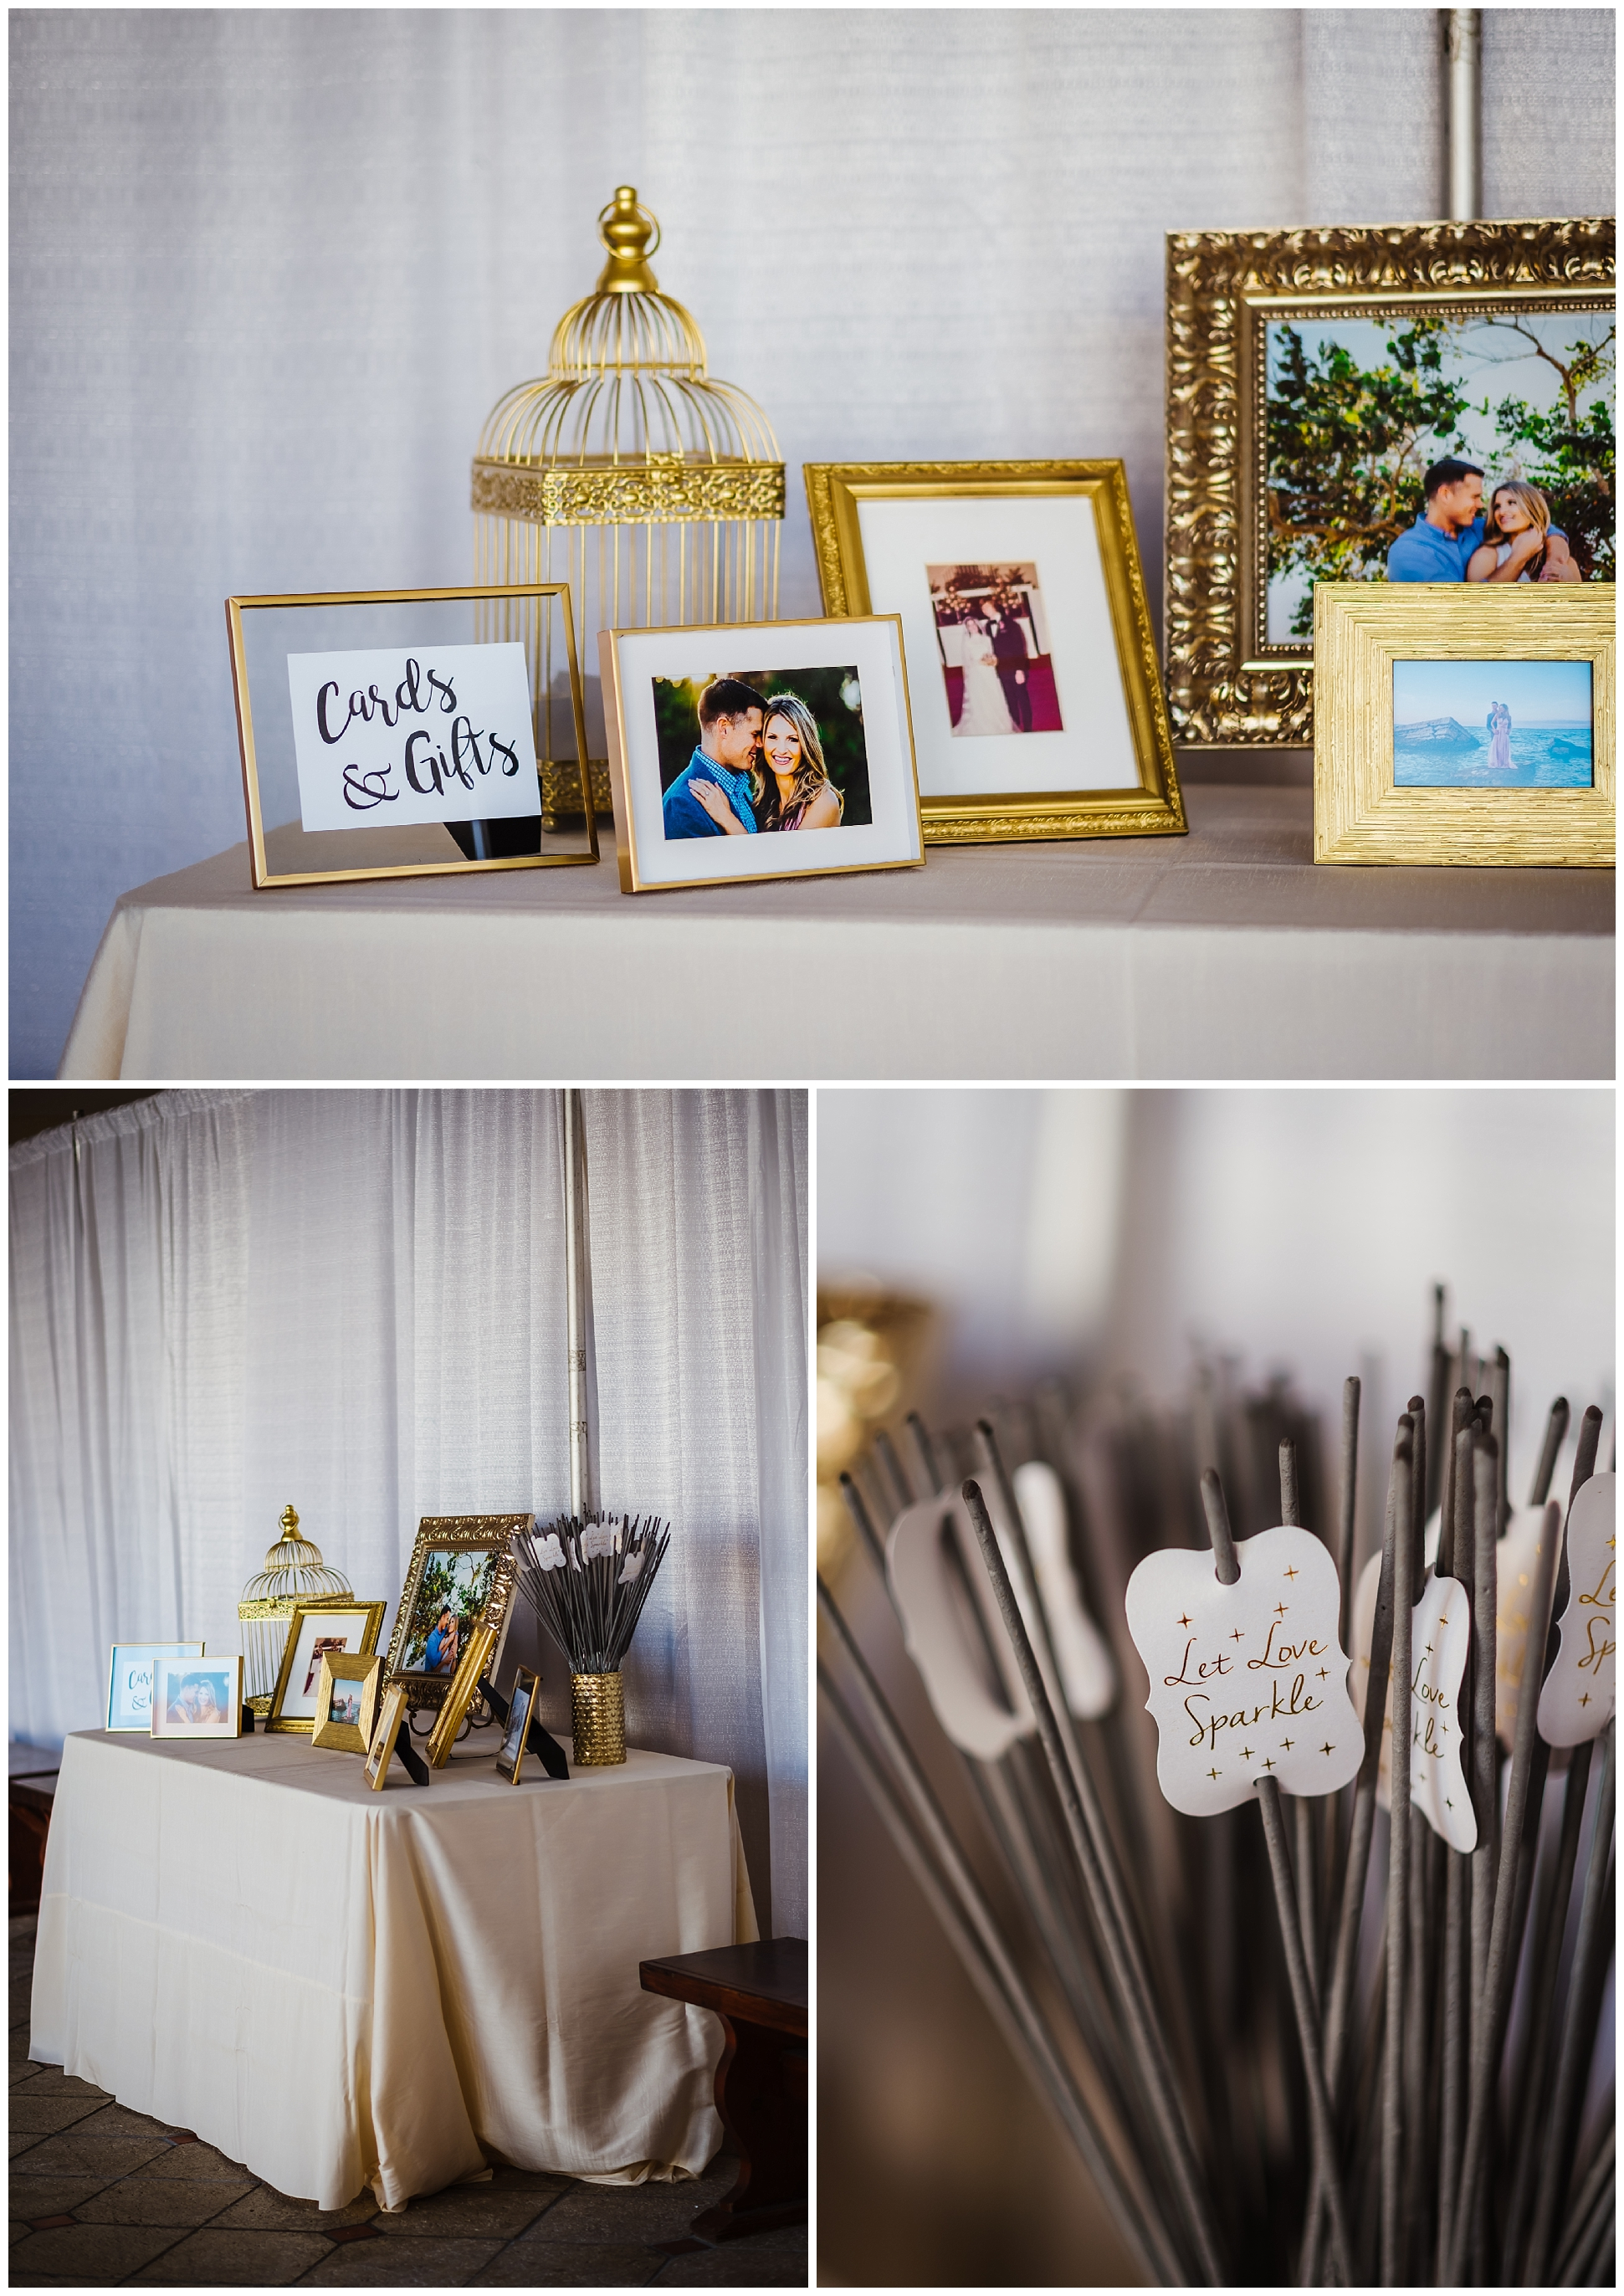 tampa-bradenton-wedding-photographer-south-florida-museum-classic-blush-gold-alpacas-sparklers_0066.jpg